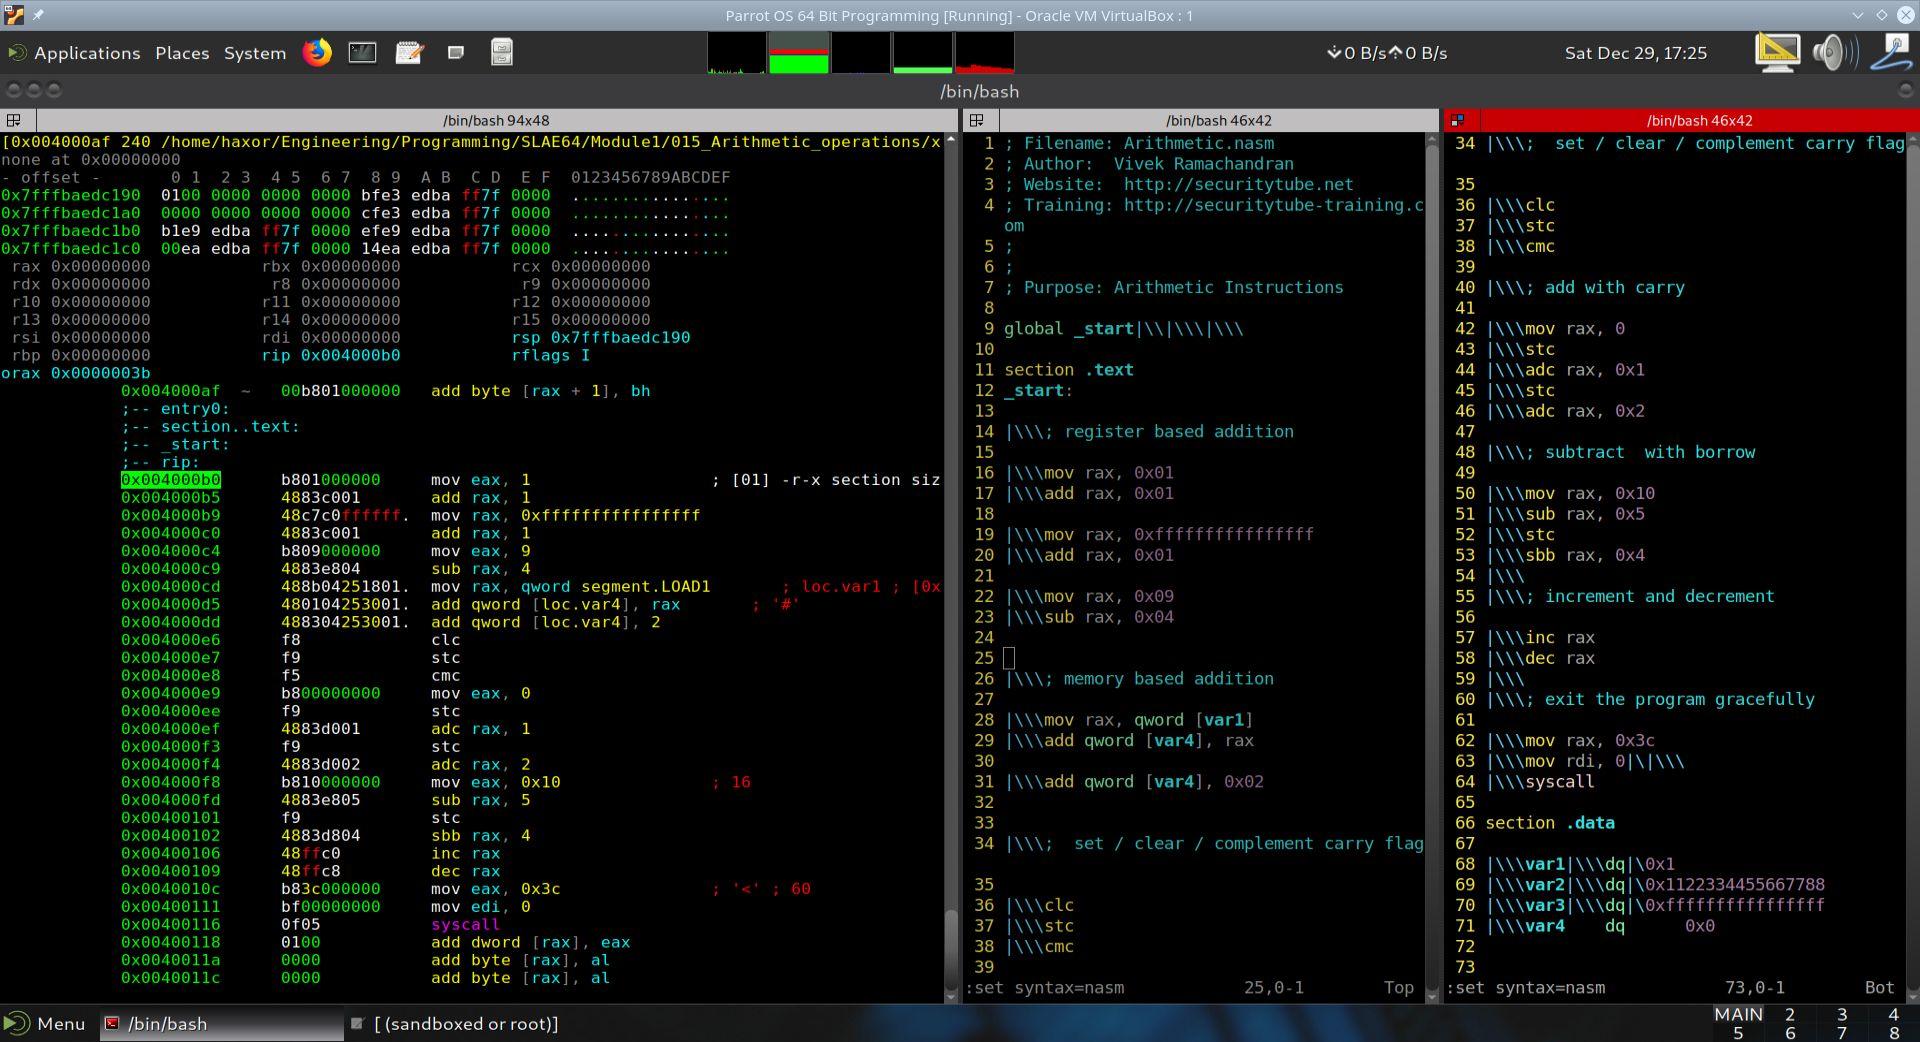 MK Dynamics - Computer Security - SLAE64 - SecurityTube